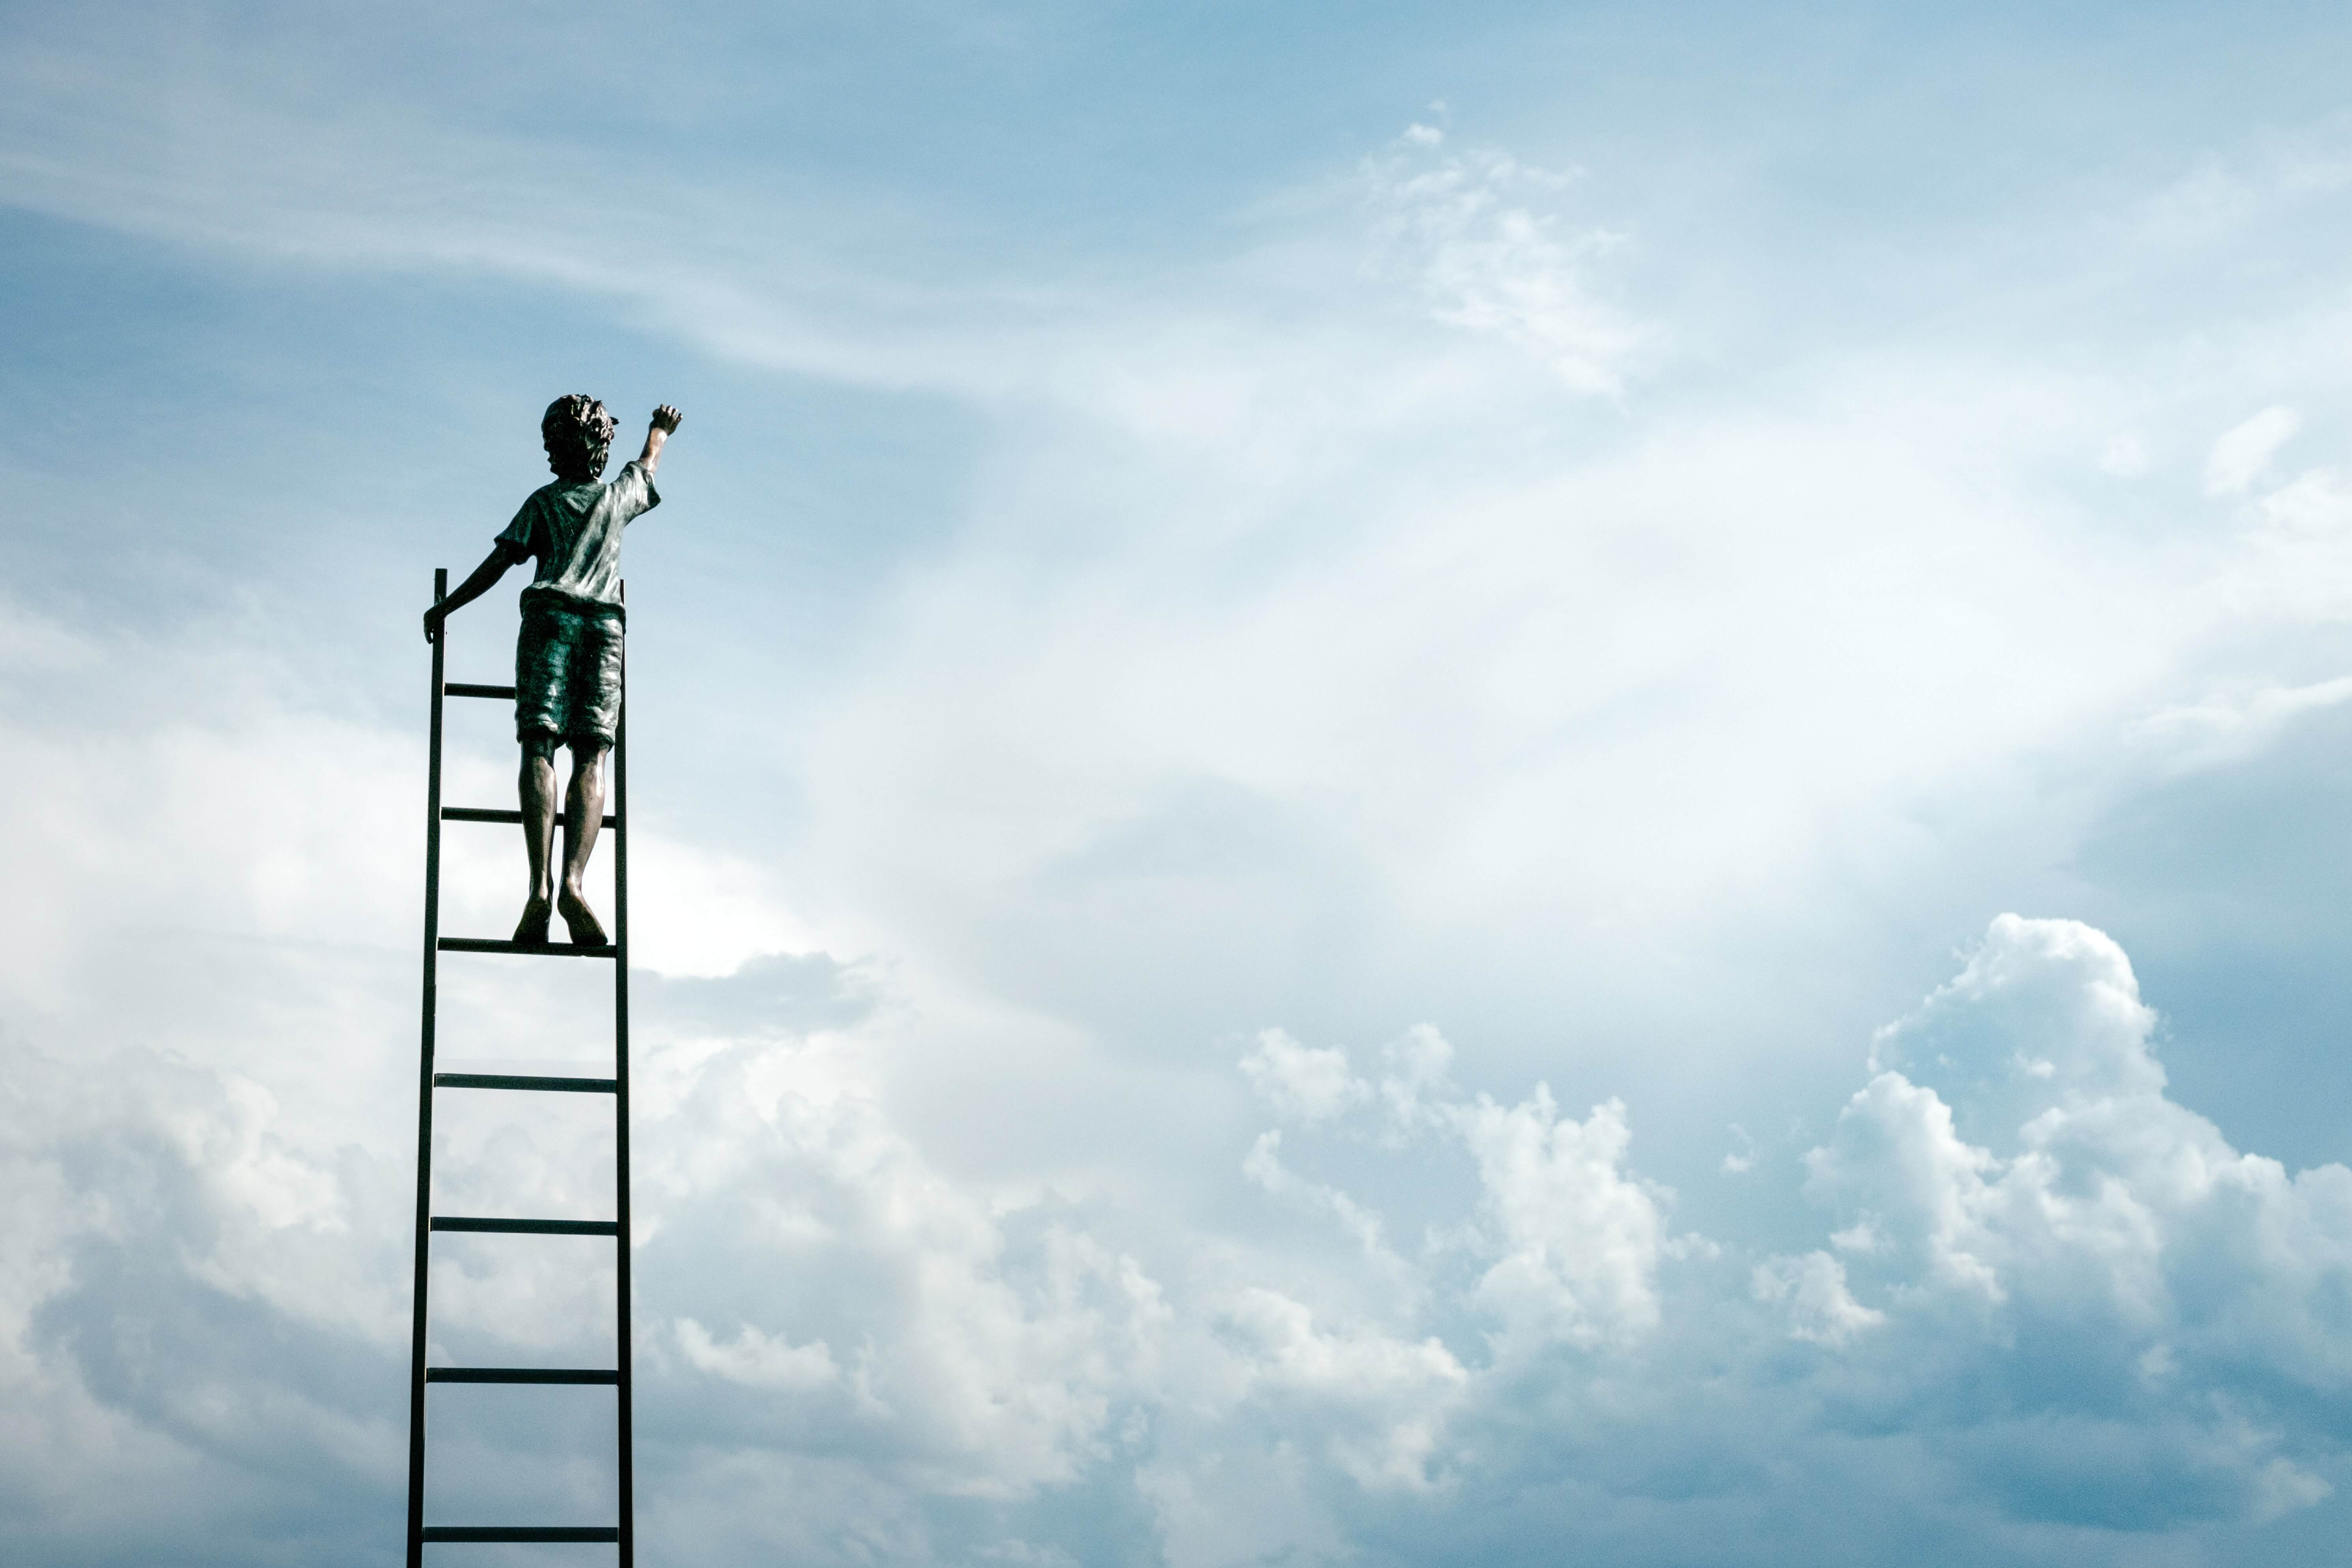 A man climbing a ladder in the sky